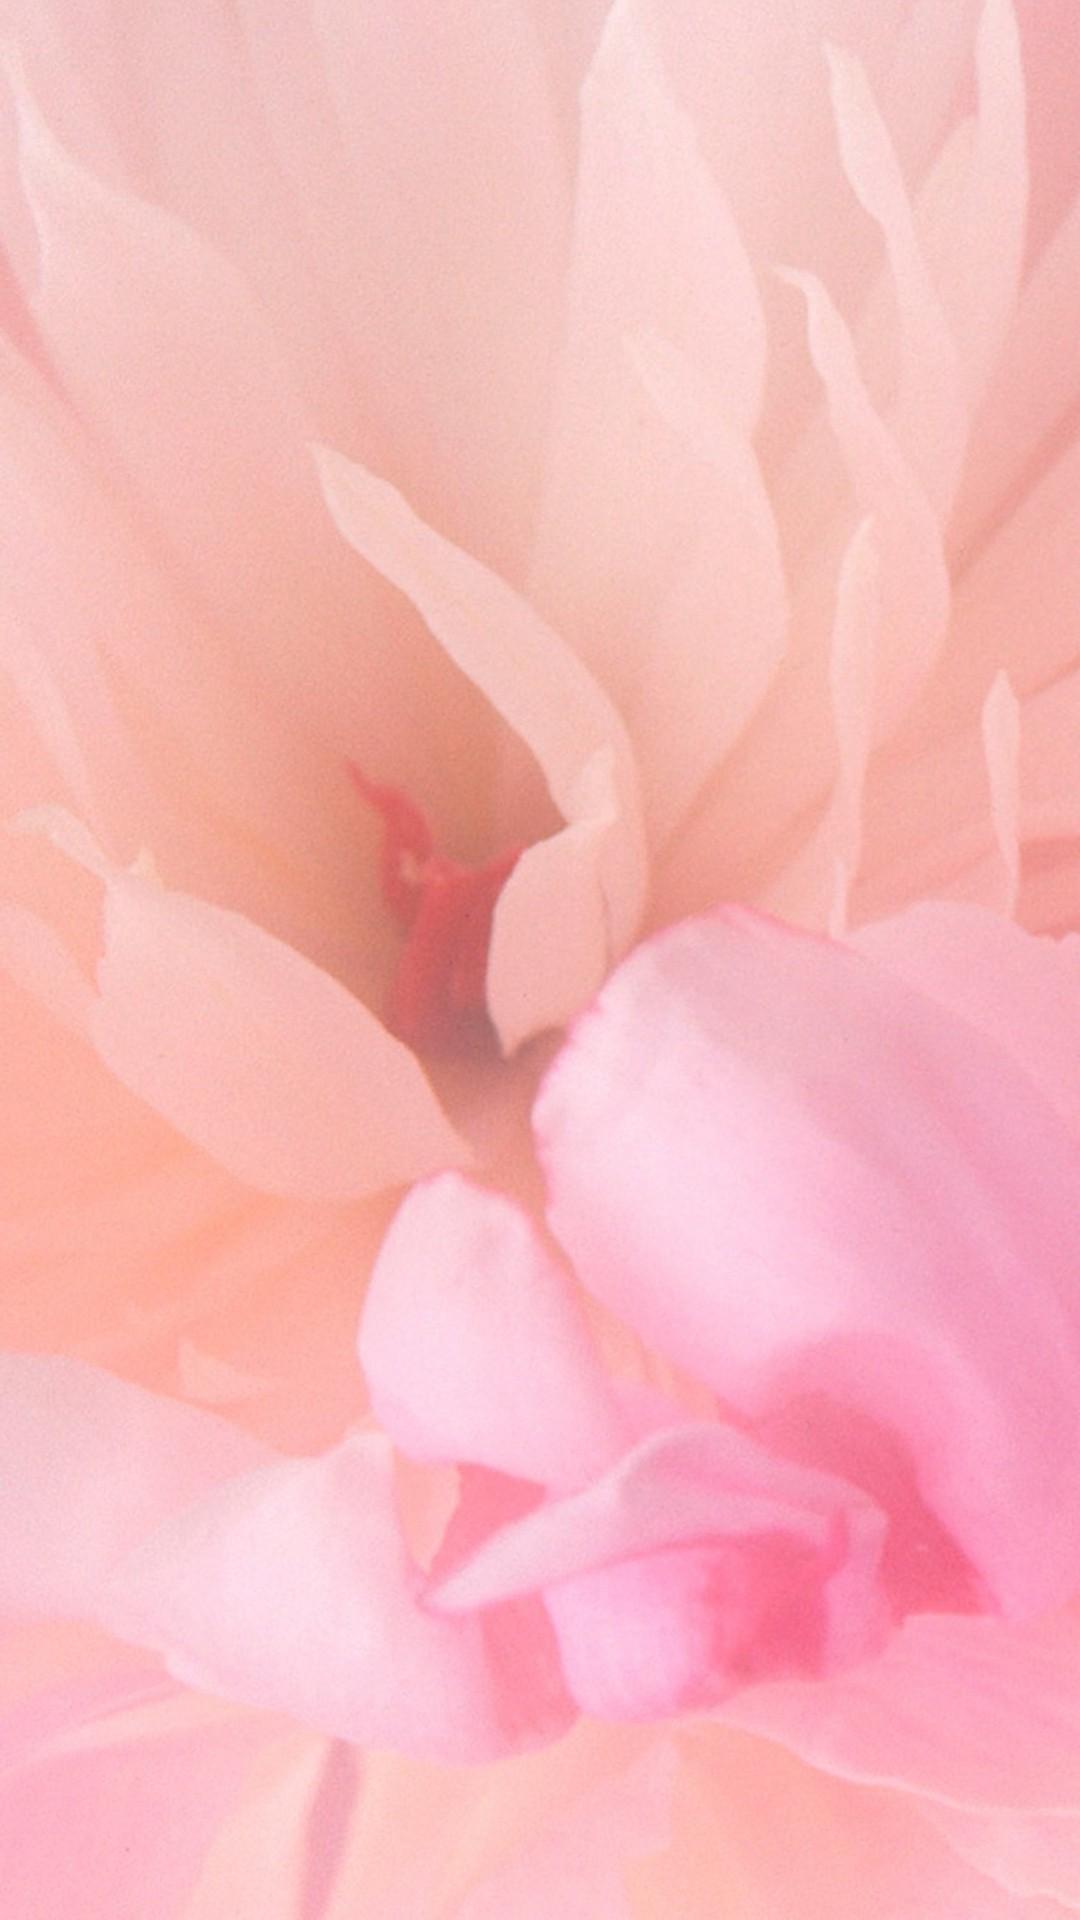 Pink iPhone hd wallpaper